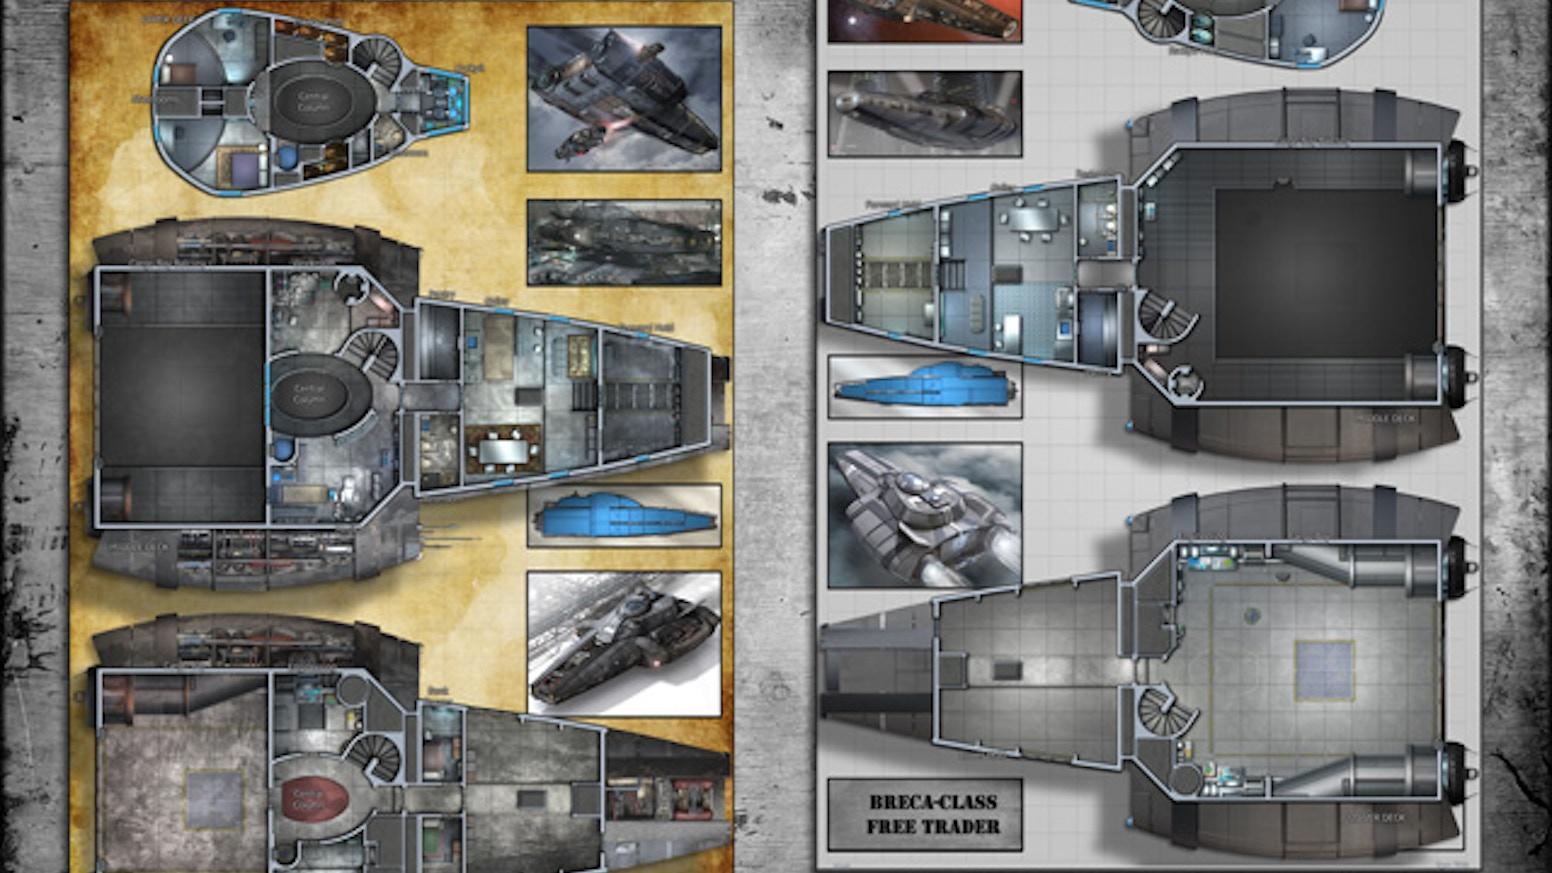 Free Trader Grendel Starship Deckplans